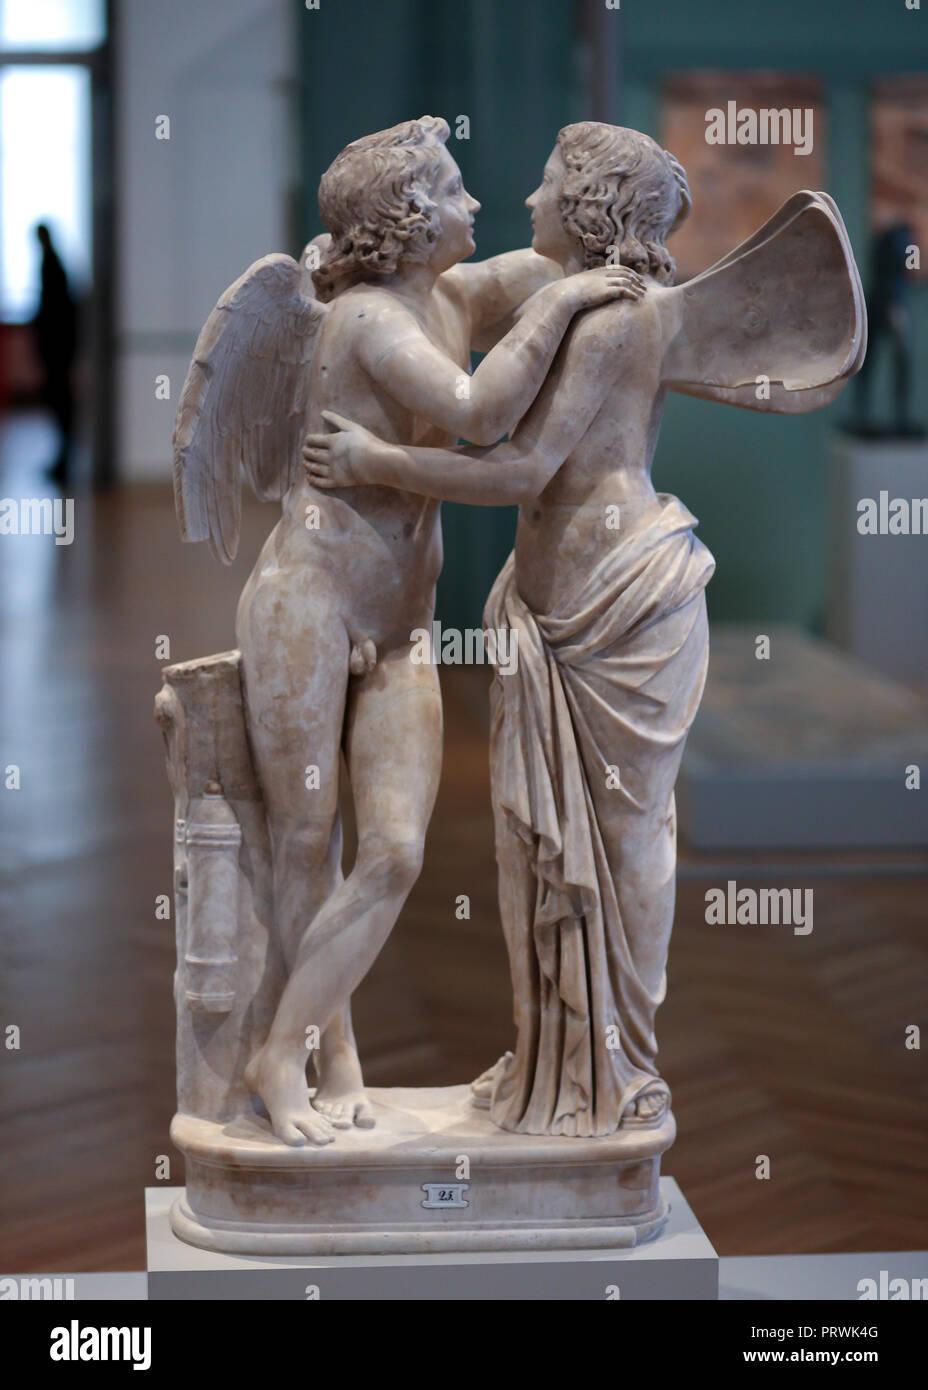 Cupidon datant site de vitesse datant Gumtree Perth rencontres